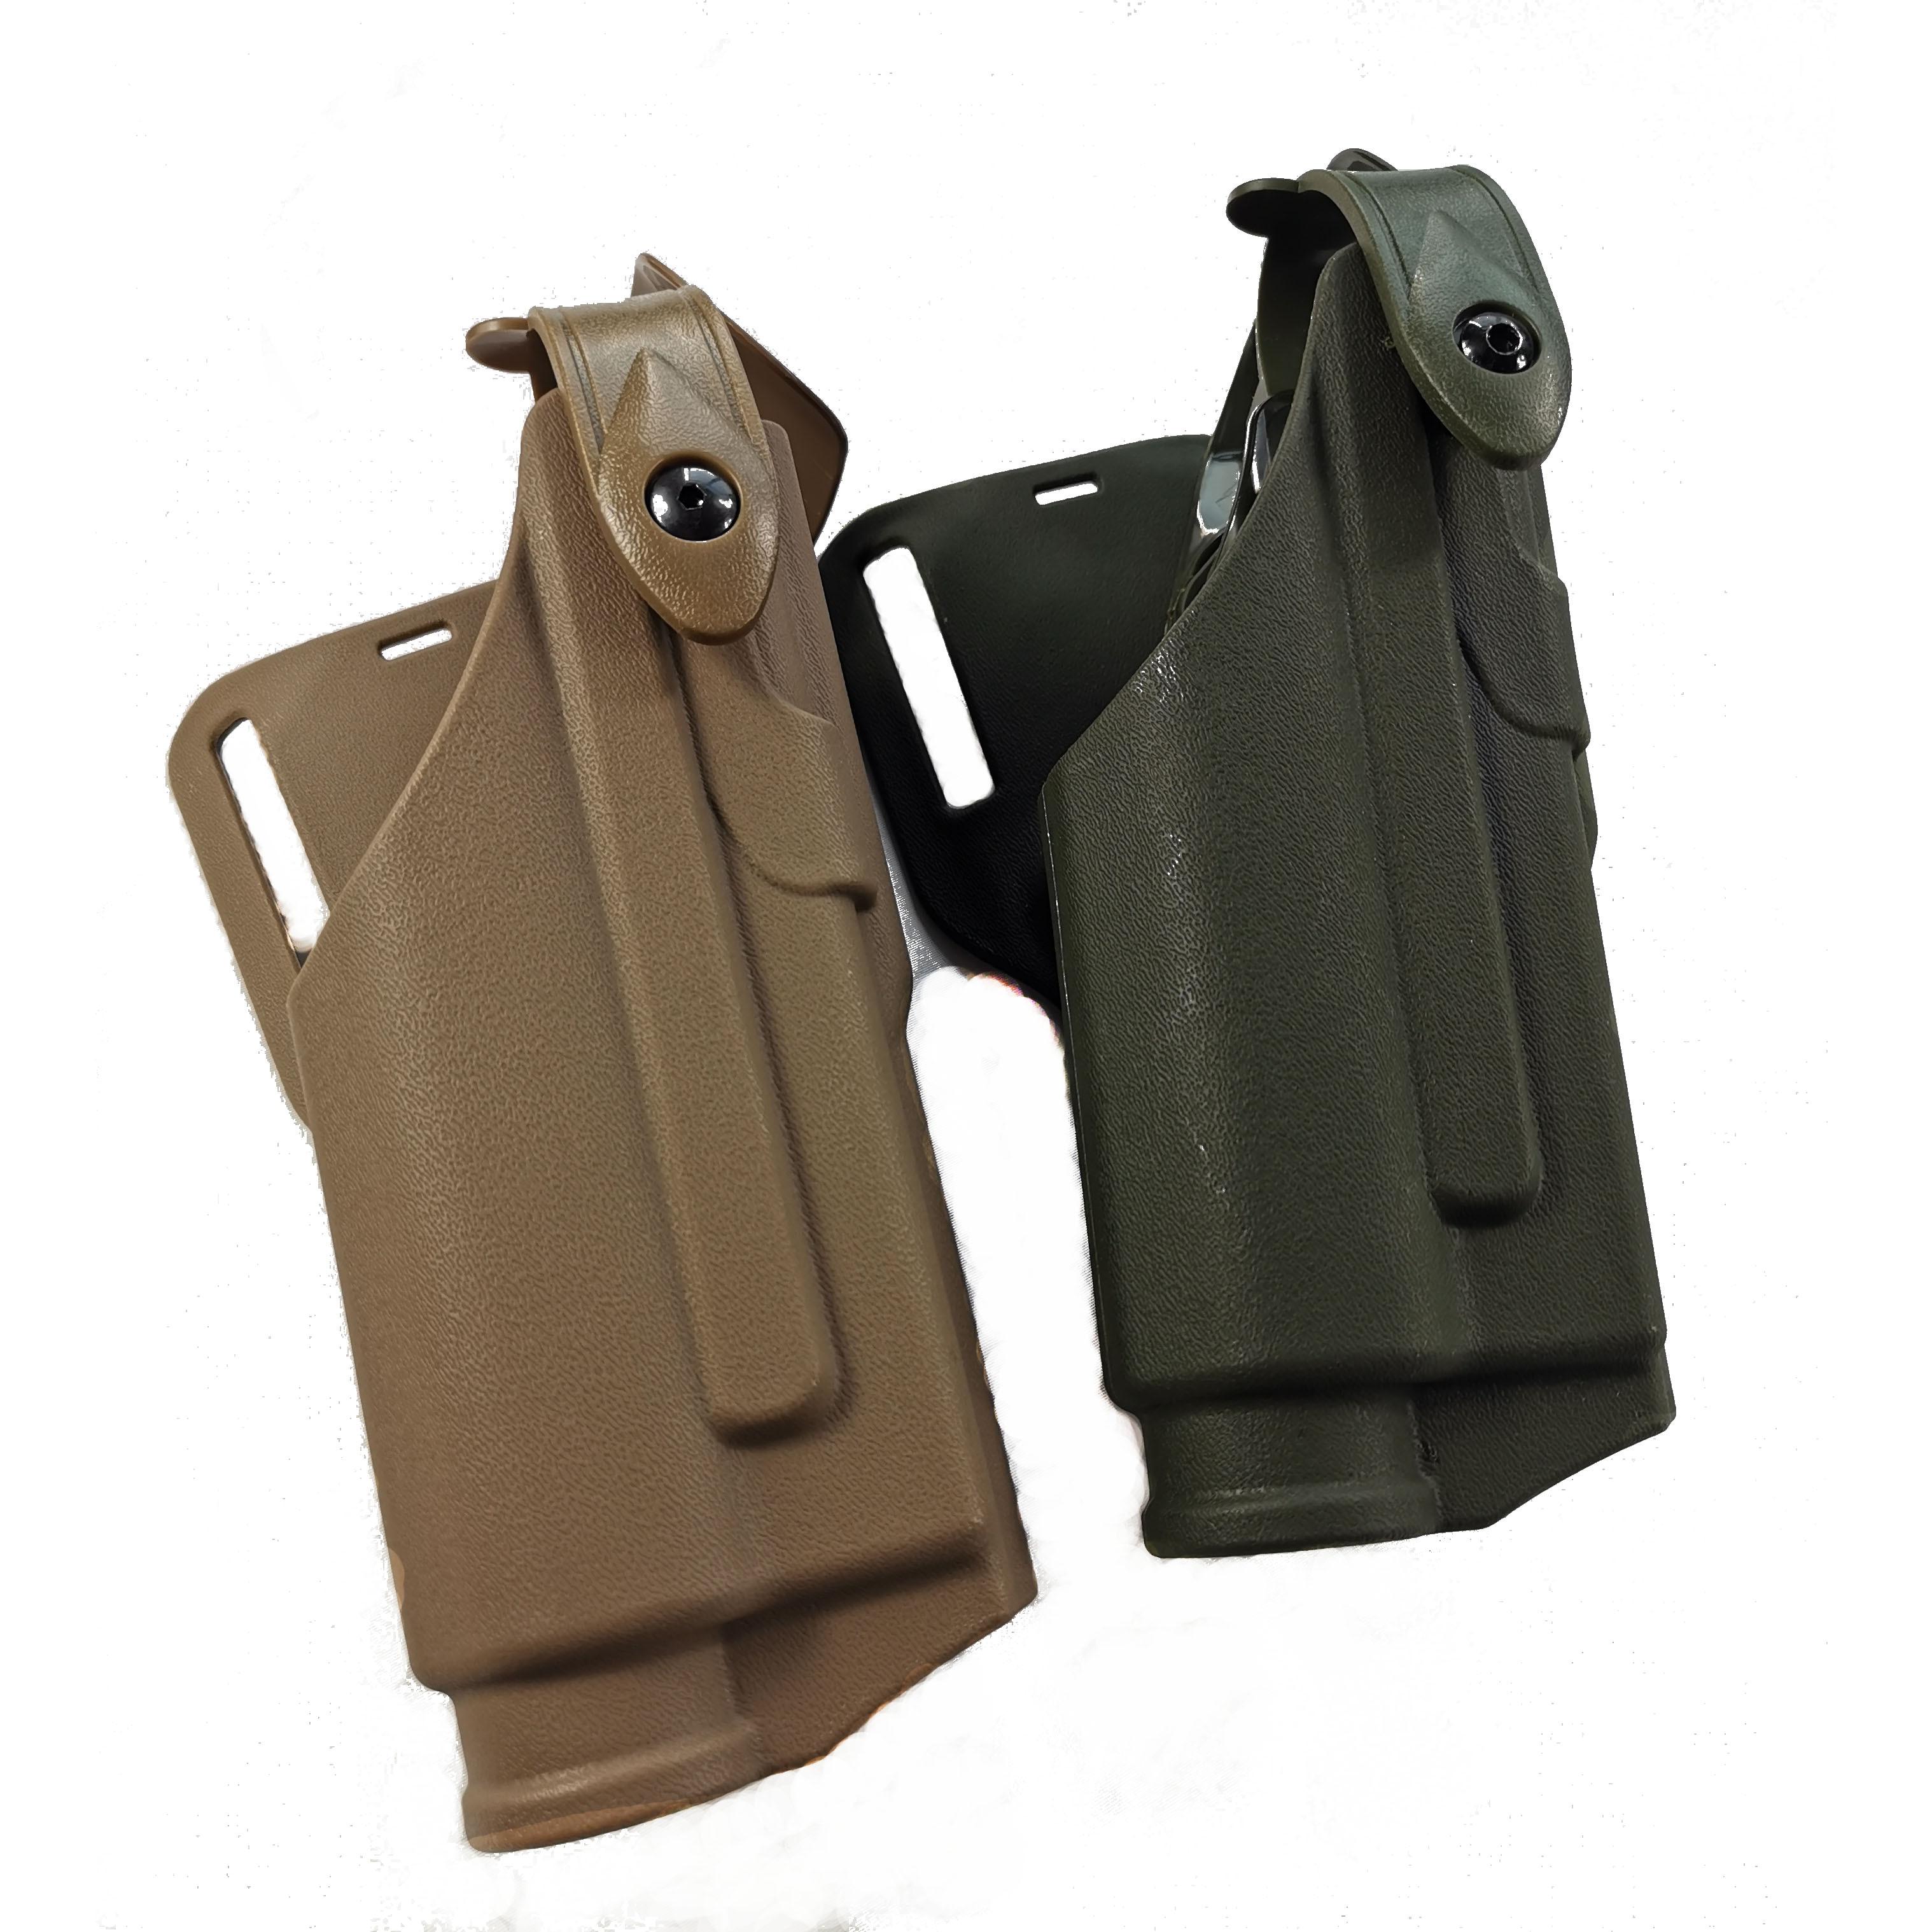 Airsoft Glock Pistol 17 19 22 23 31 32 Belt Holsters Bearing Flashlight Tactical Light Bearing Glock Holster